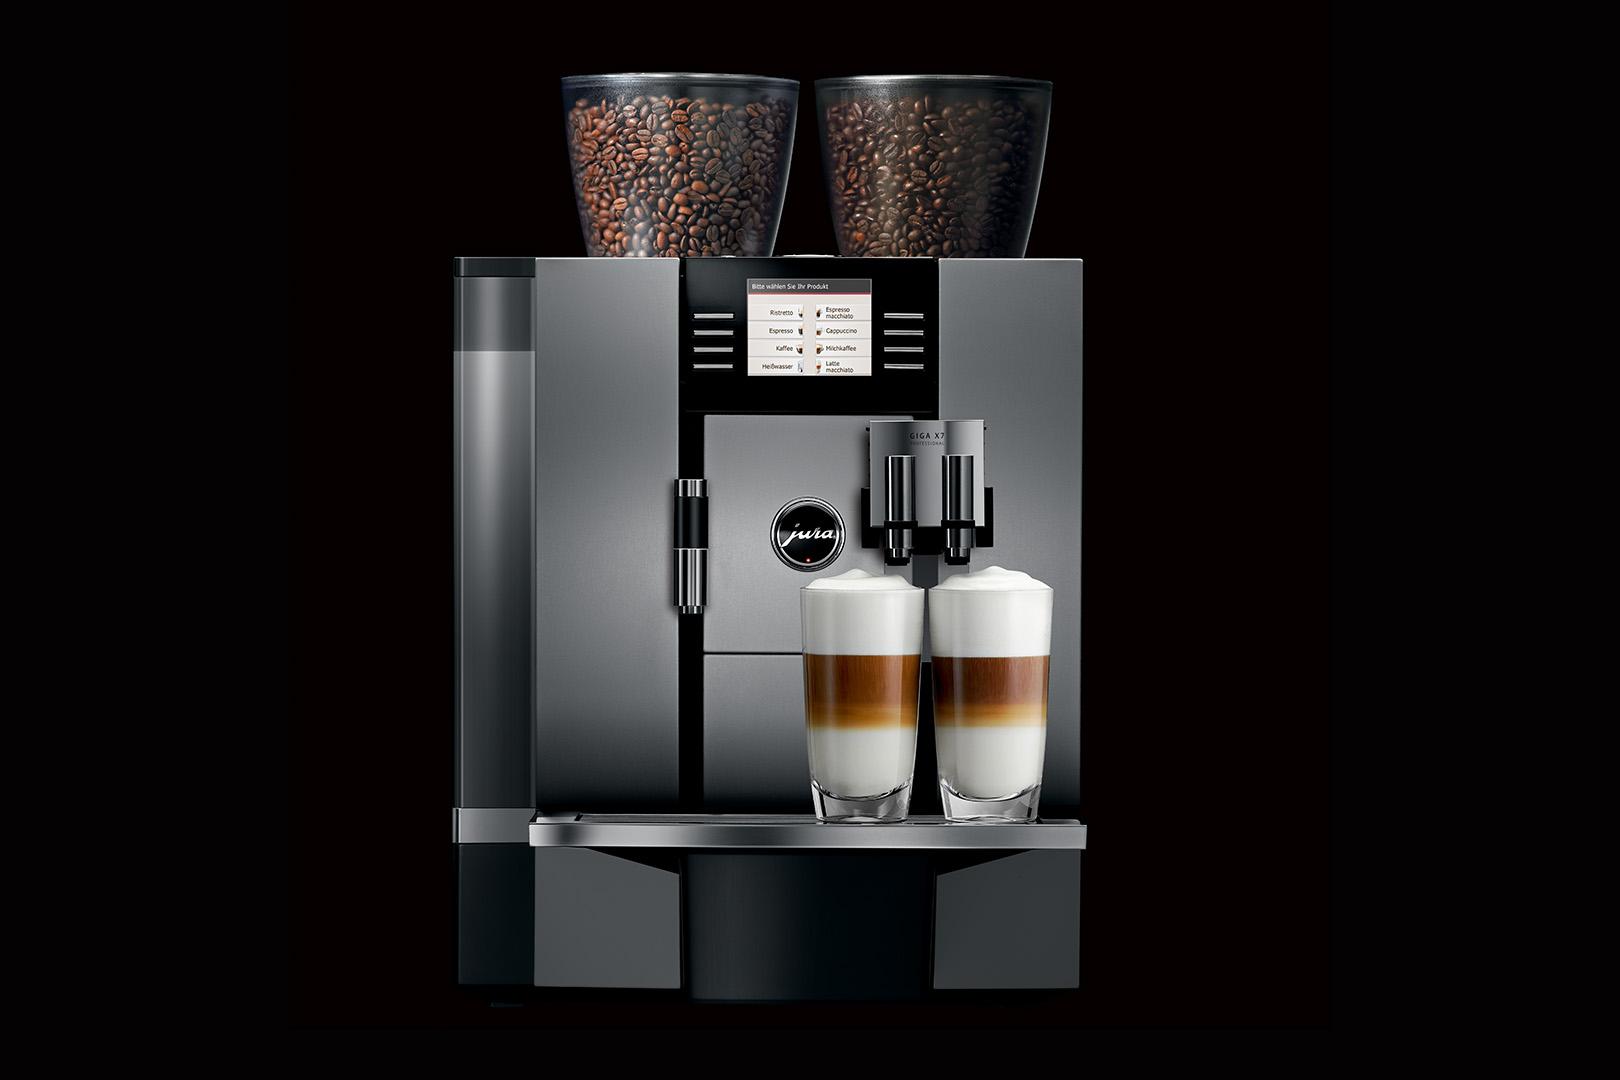 jura coffee machine cleaning instructions